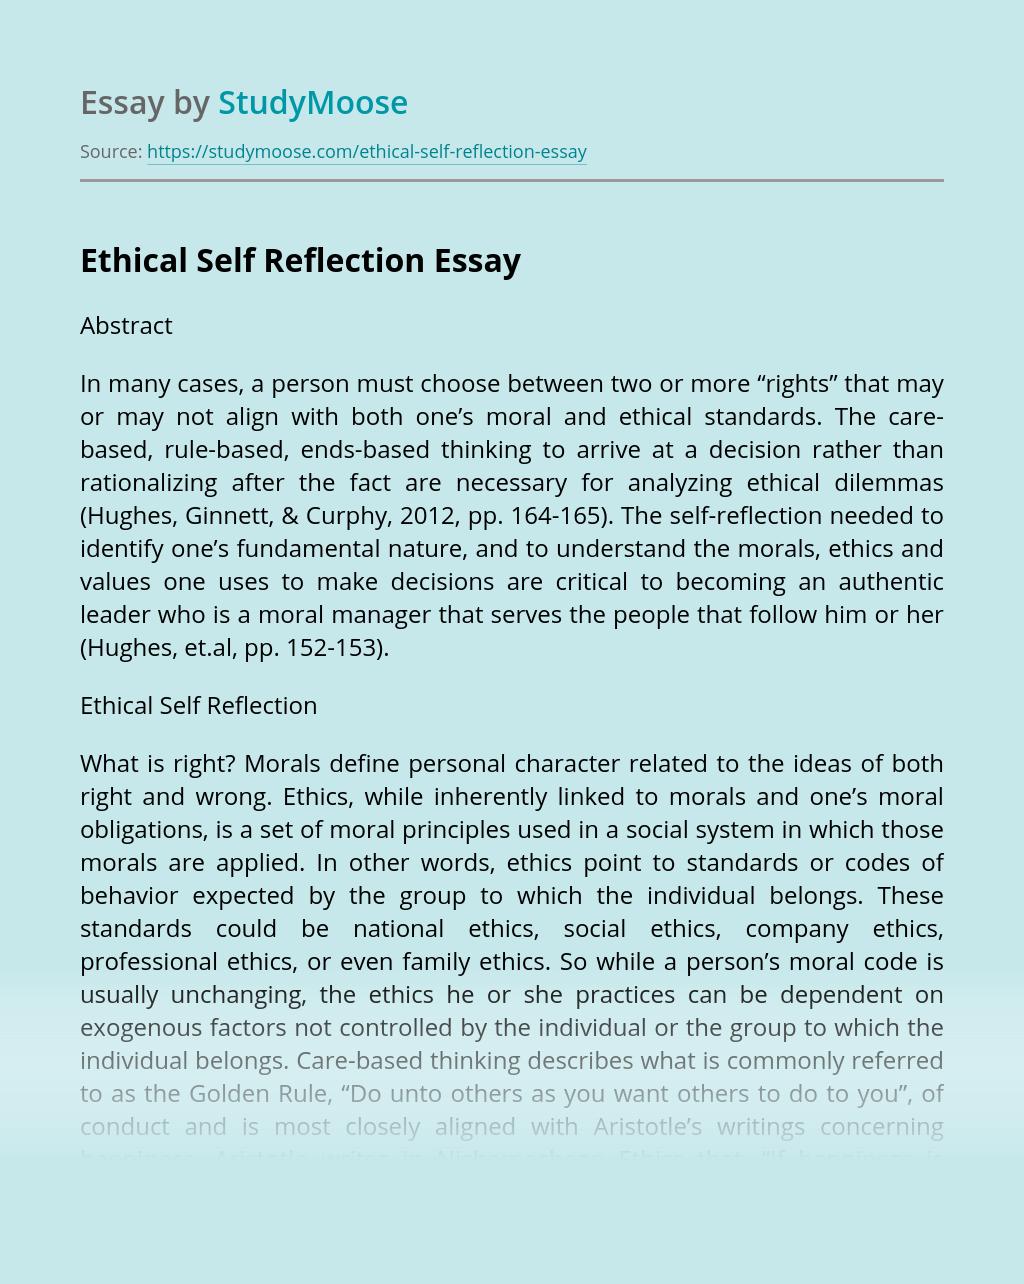 Ethical Self Reflection